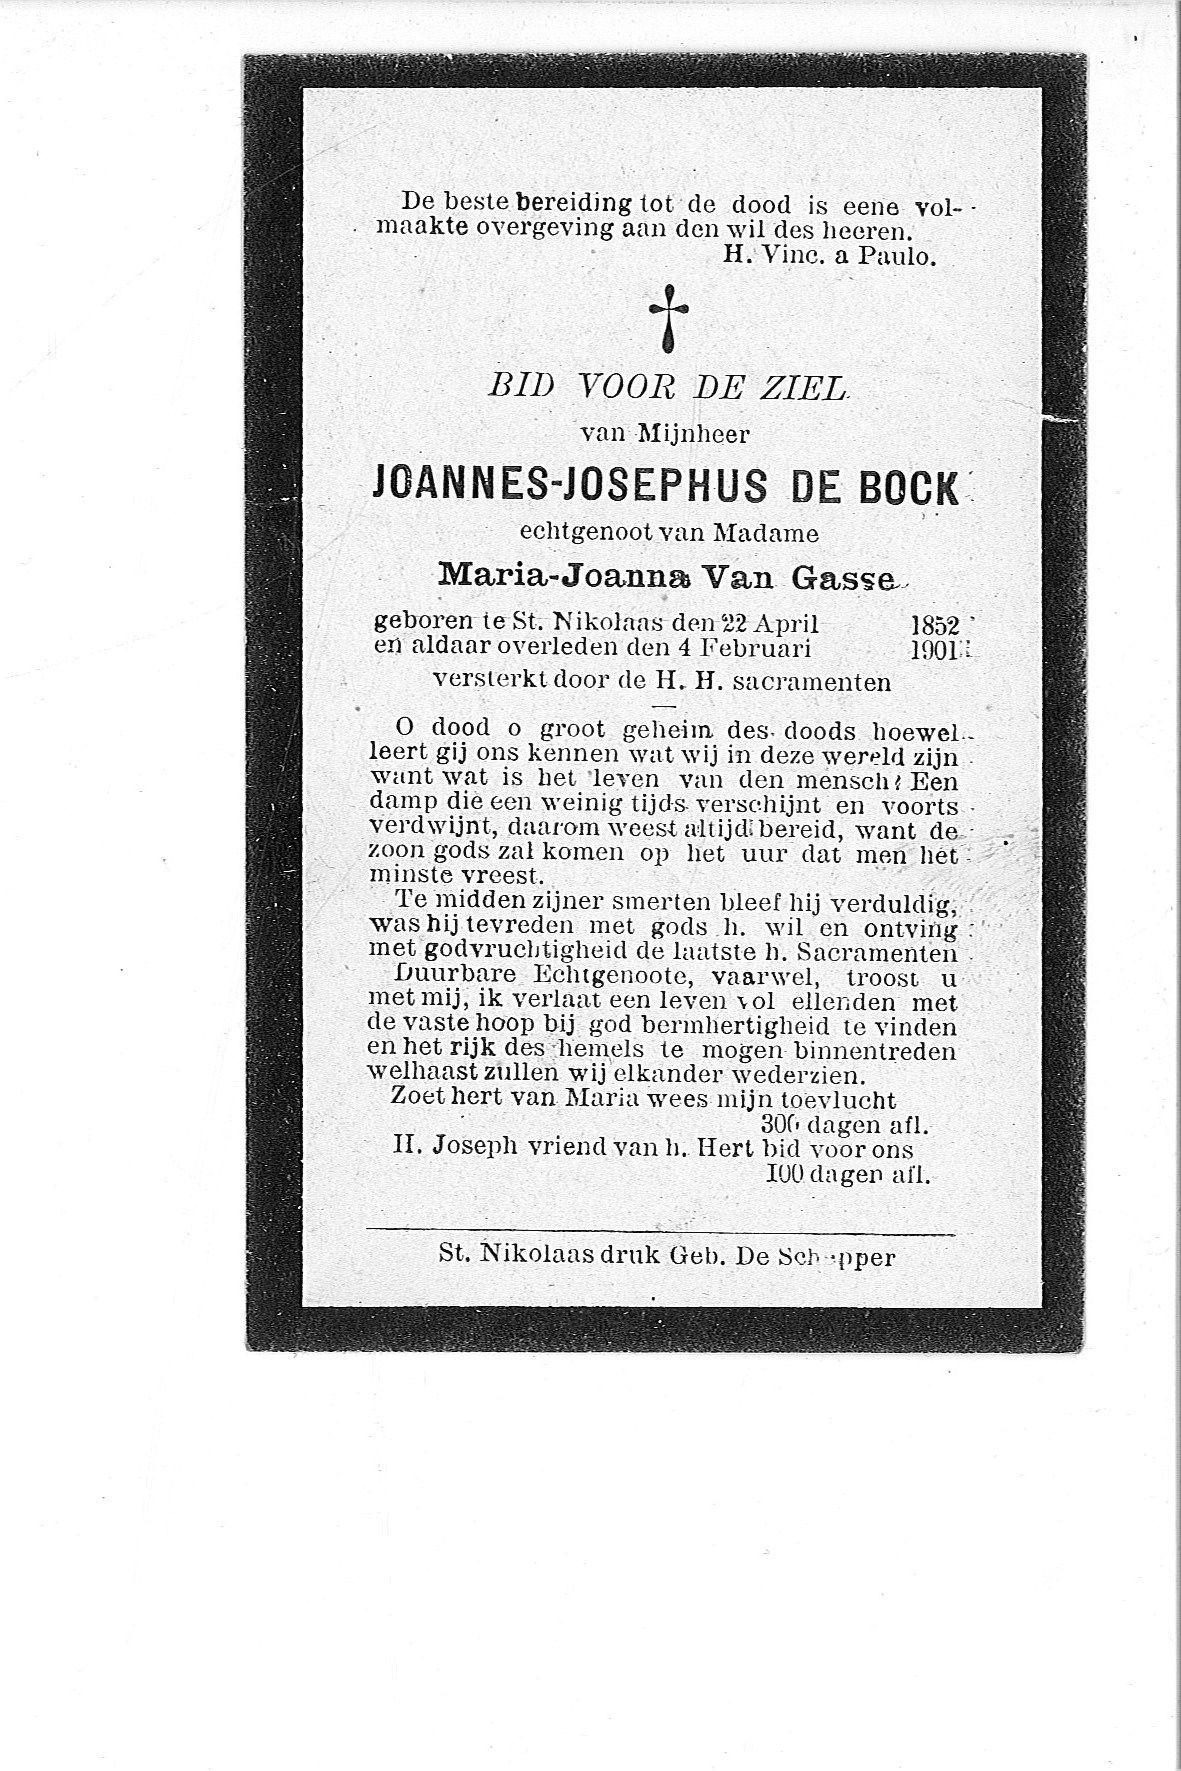 joannes-josephus-(1901)20090330085831_00029.jpg